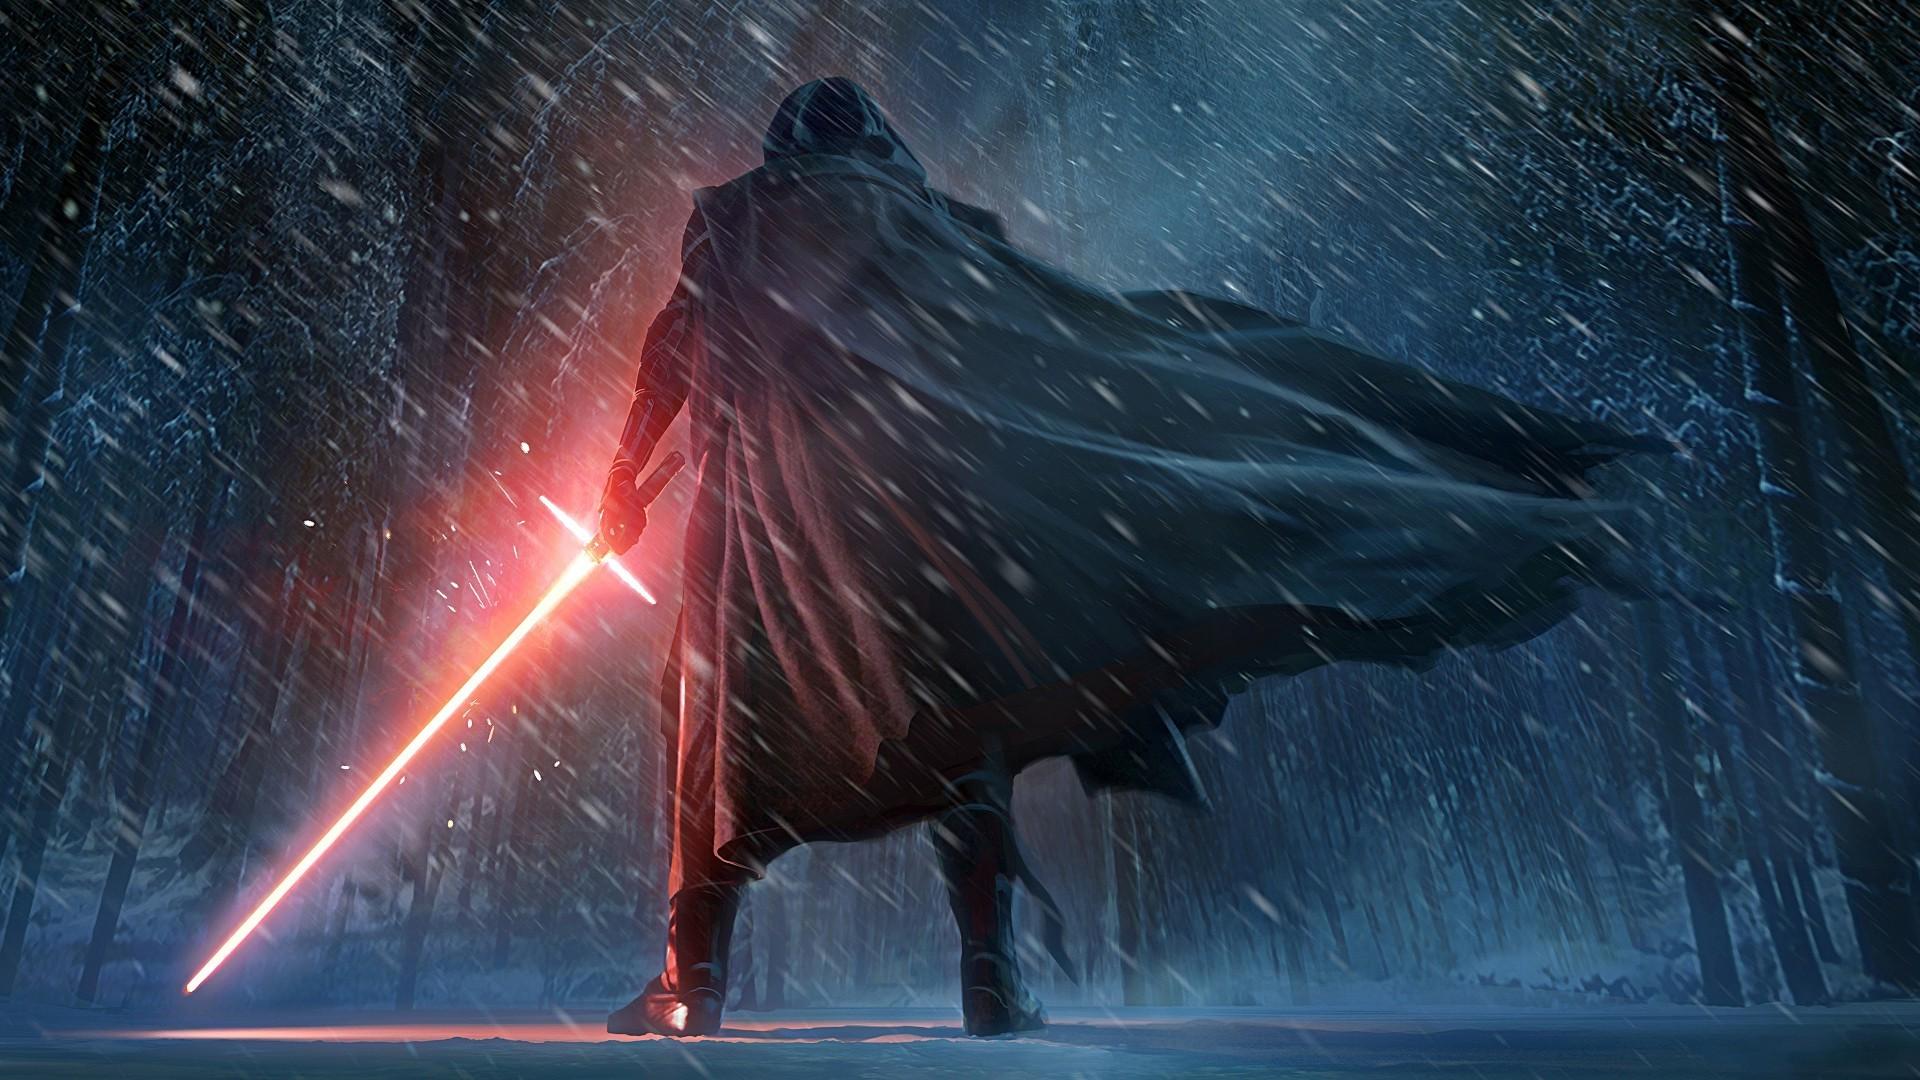 Full Hd Star Wars 373920 Hd Wallpaper Backgrounds Download